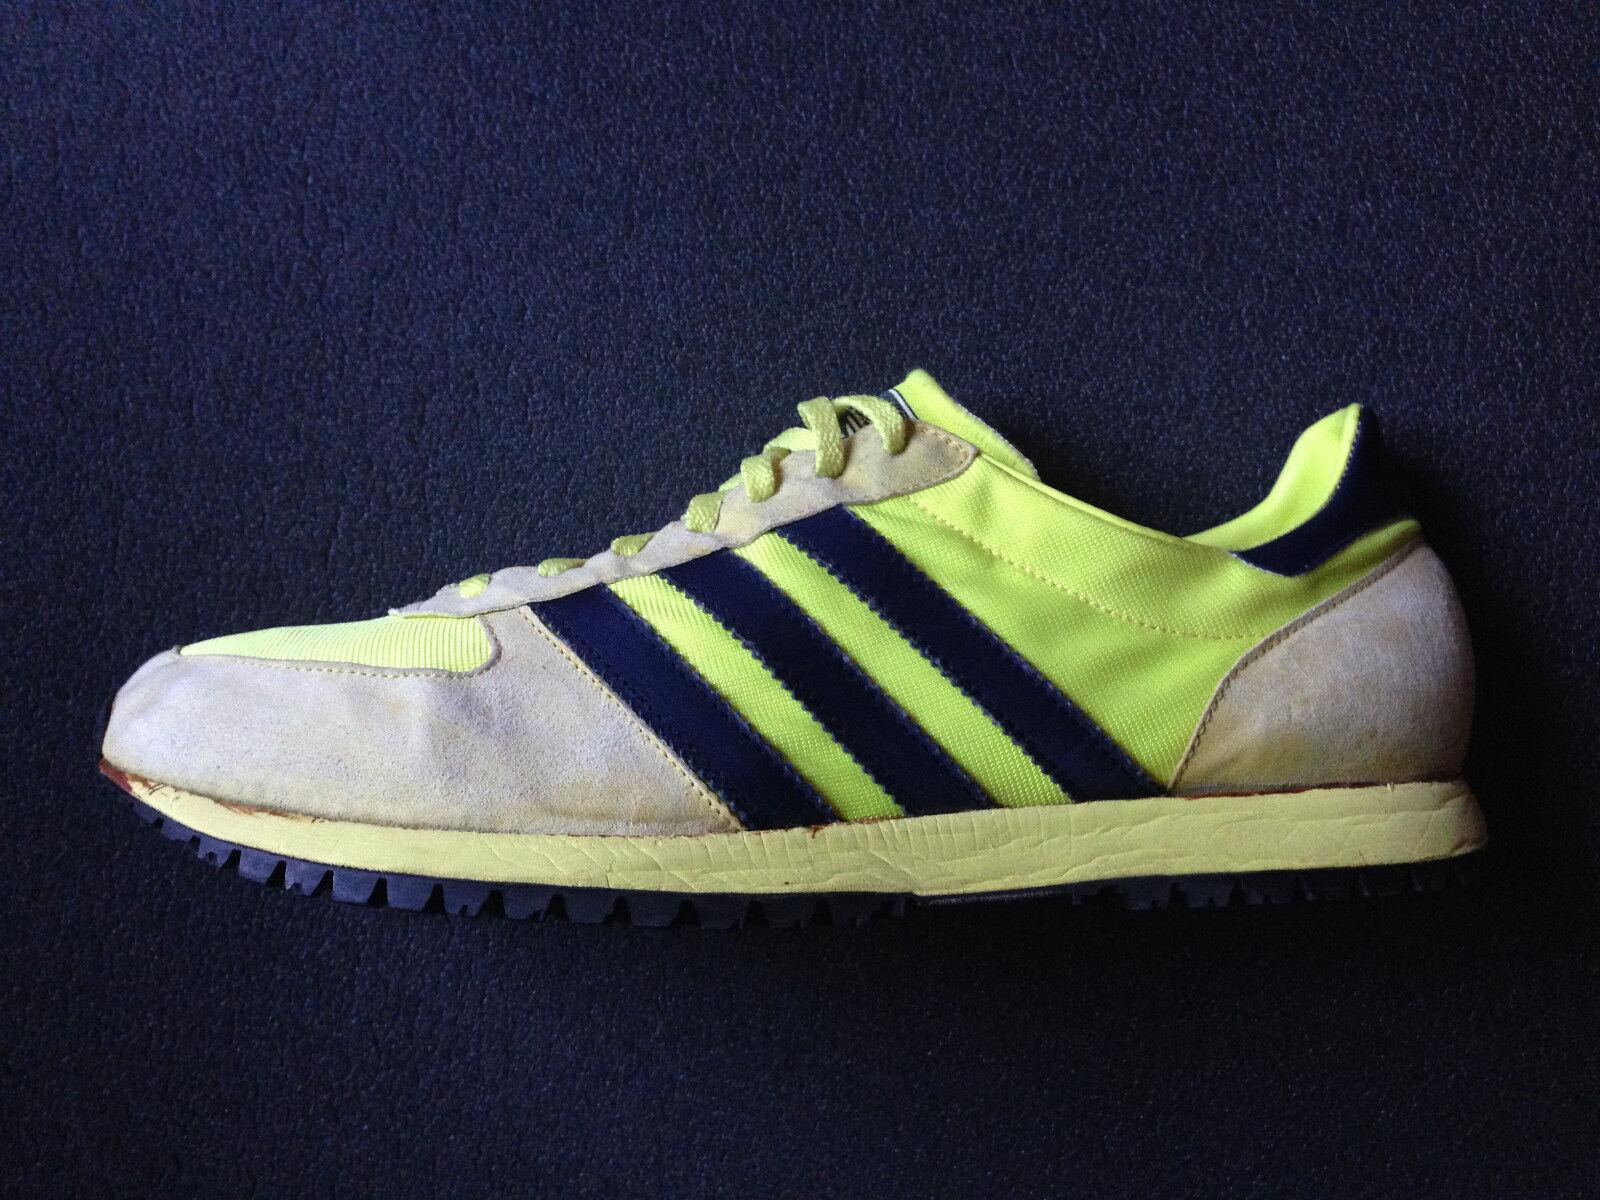 Adidas Marathon 84  Made in West Germany  vintage 1984 US 12 UK 11,5 EUR 46 2 3